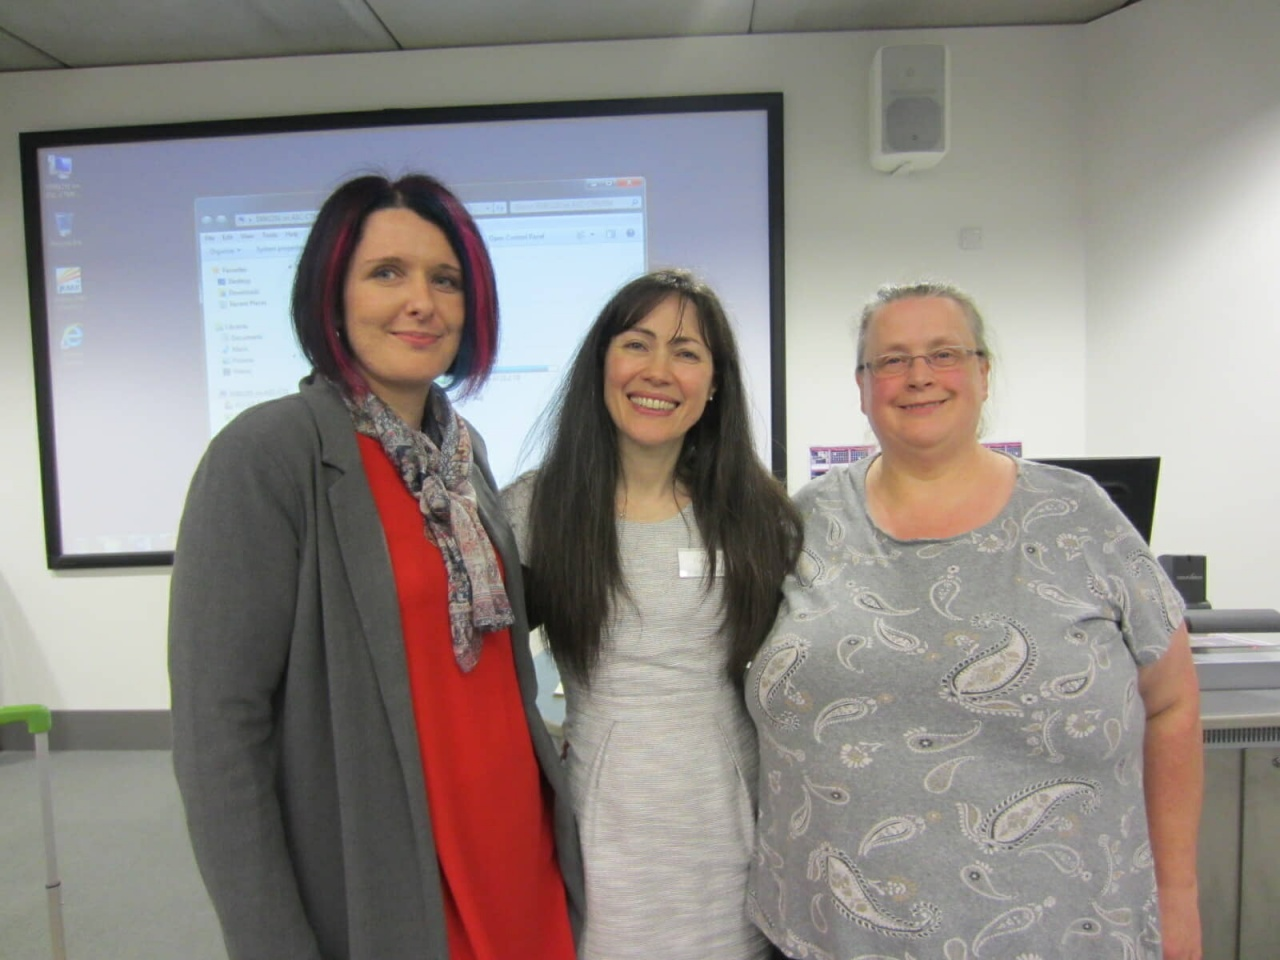 Conference leaders Debbie Lea, Florencia Franceschina and Jen Magson